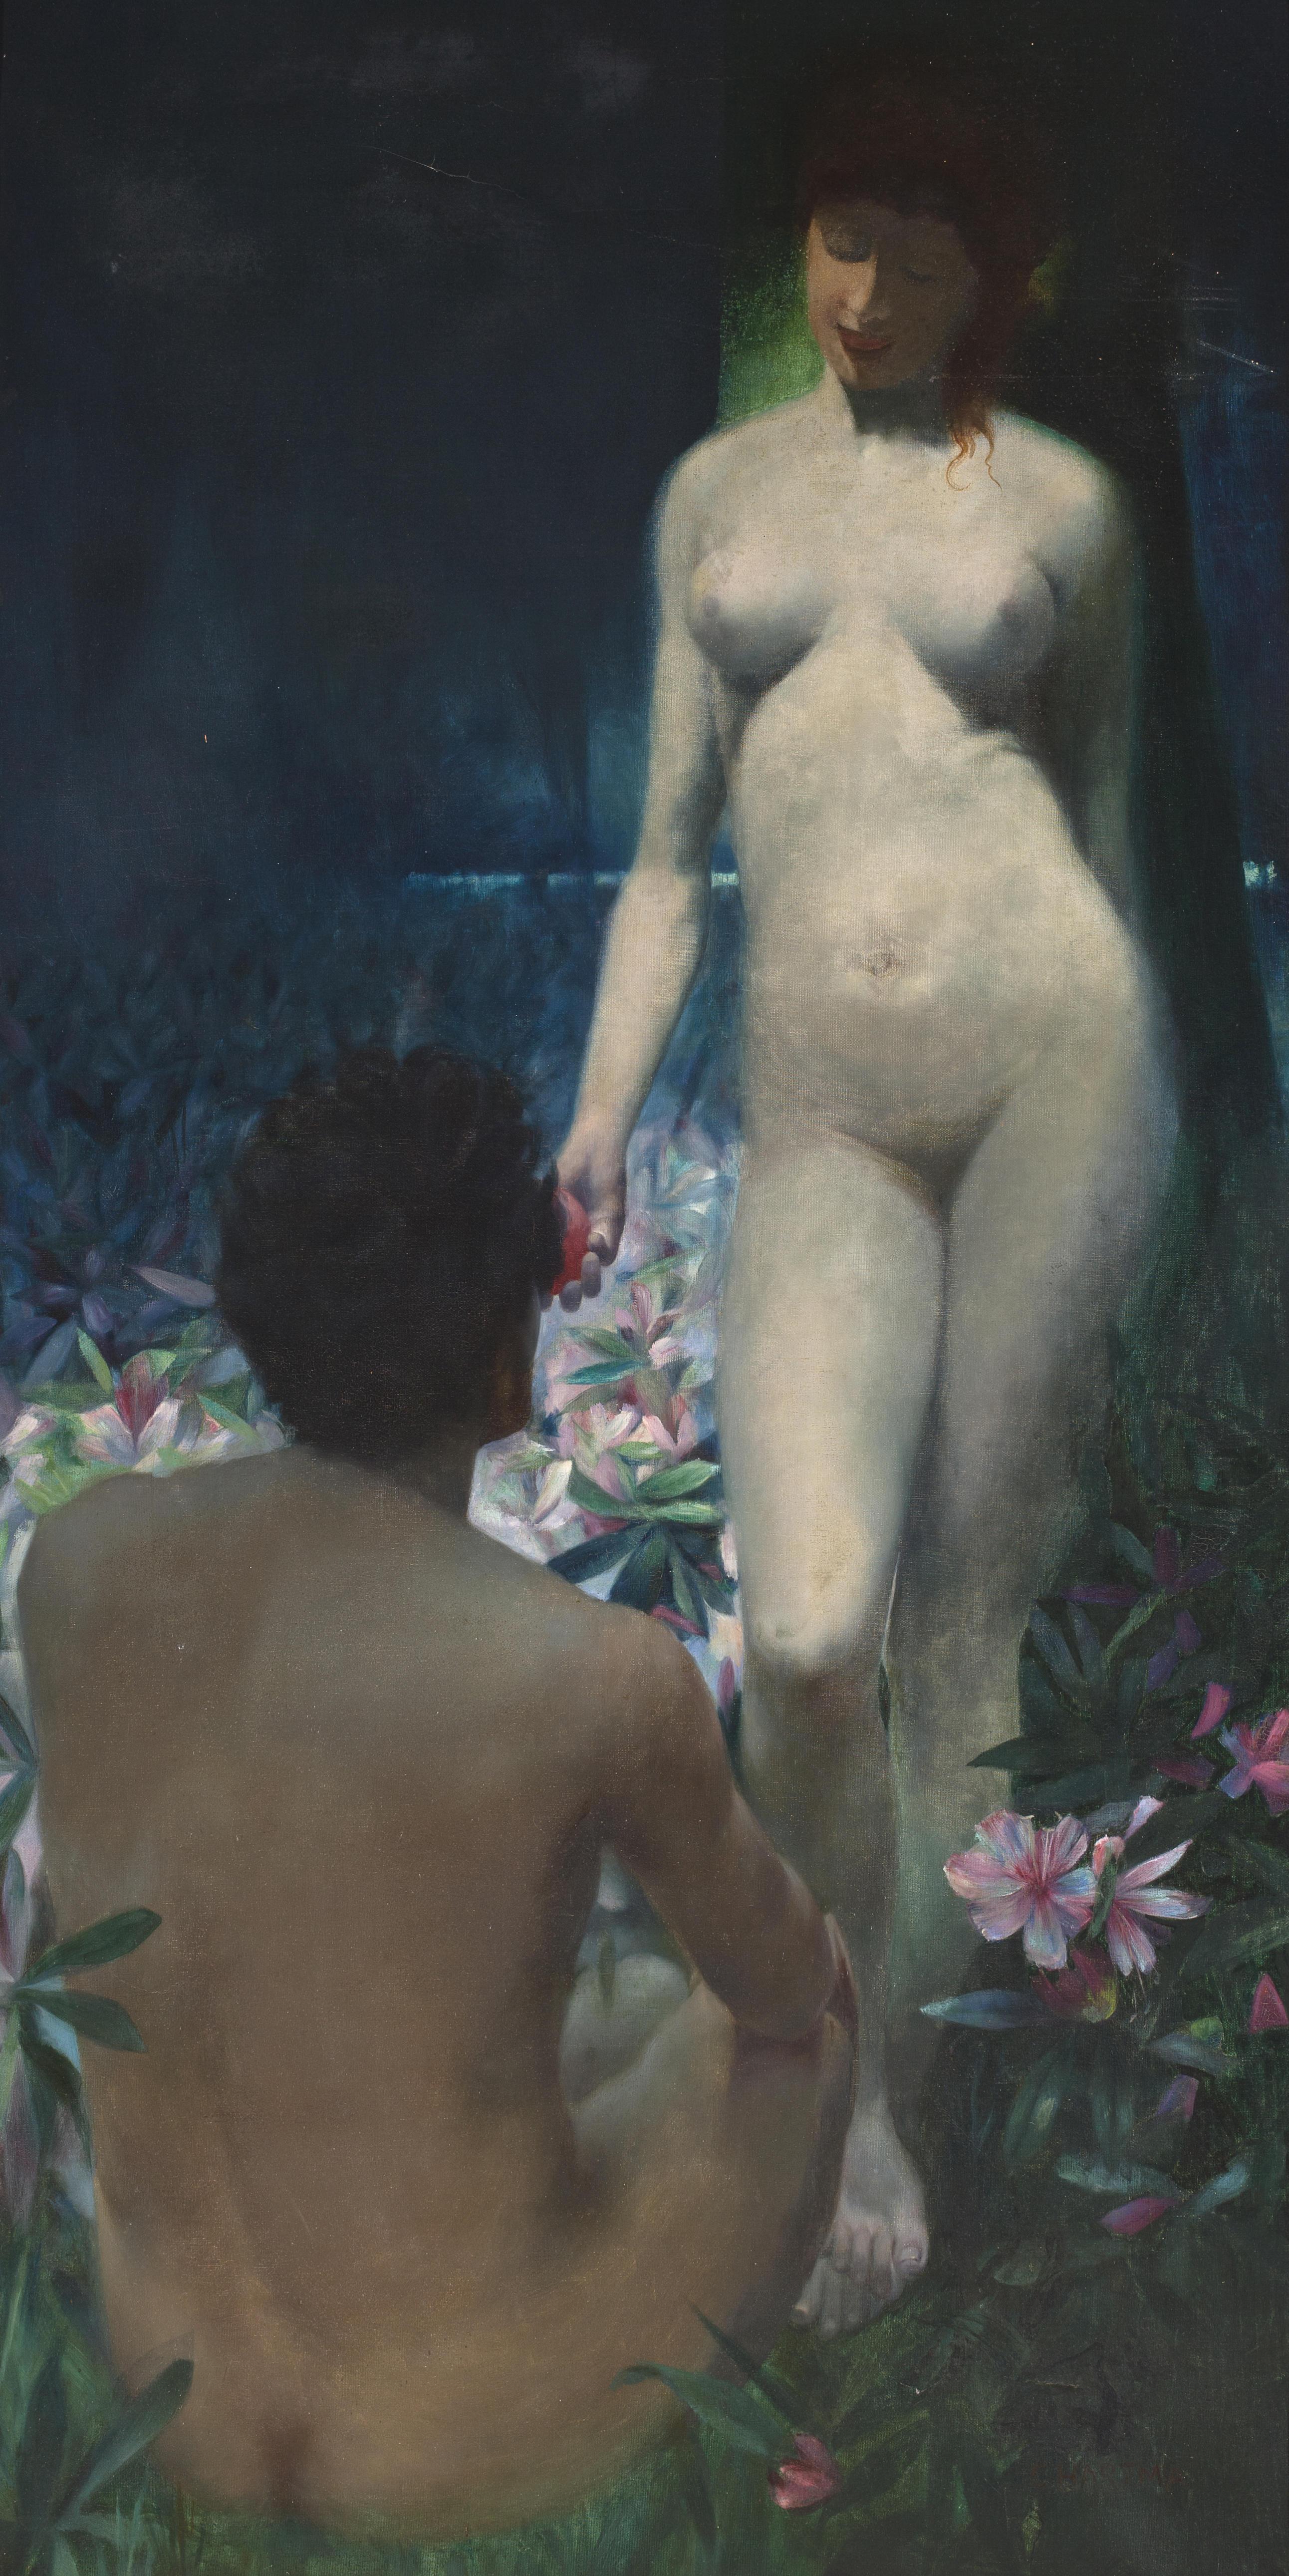 C. Hartma. Ева соблазняет Адама. 198.8 х 100.3 см. Частная коллекция